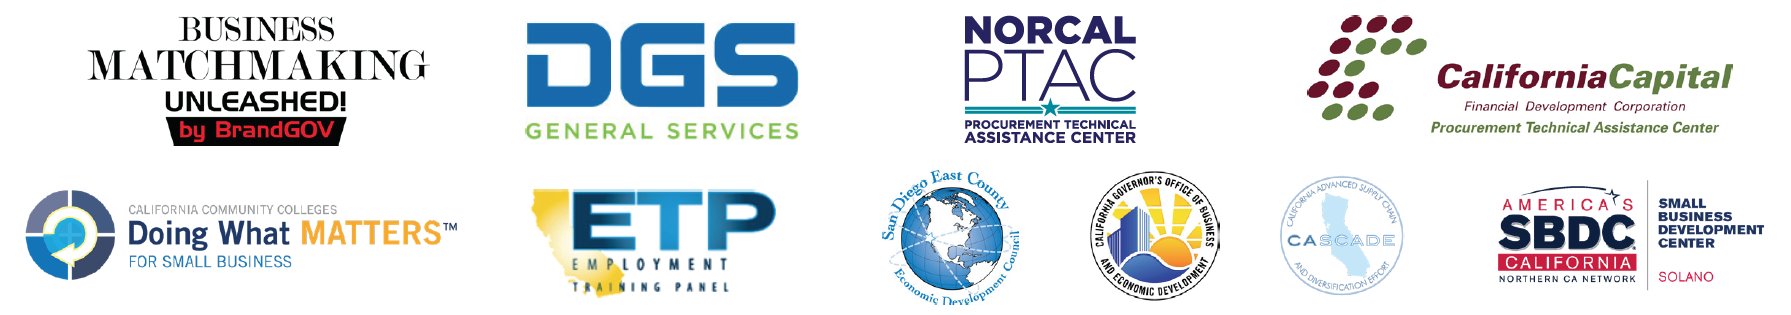 Norcal Defense Supply Chain Resource Fair & Procurement Expo